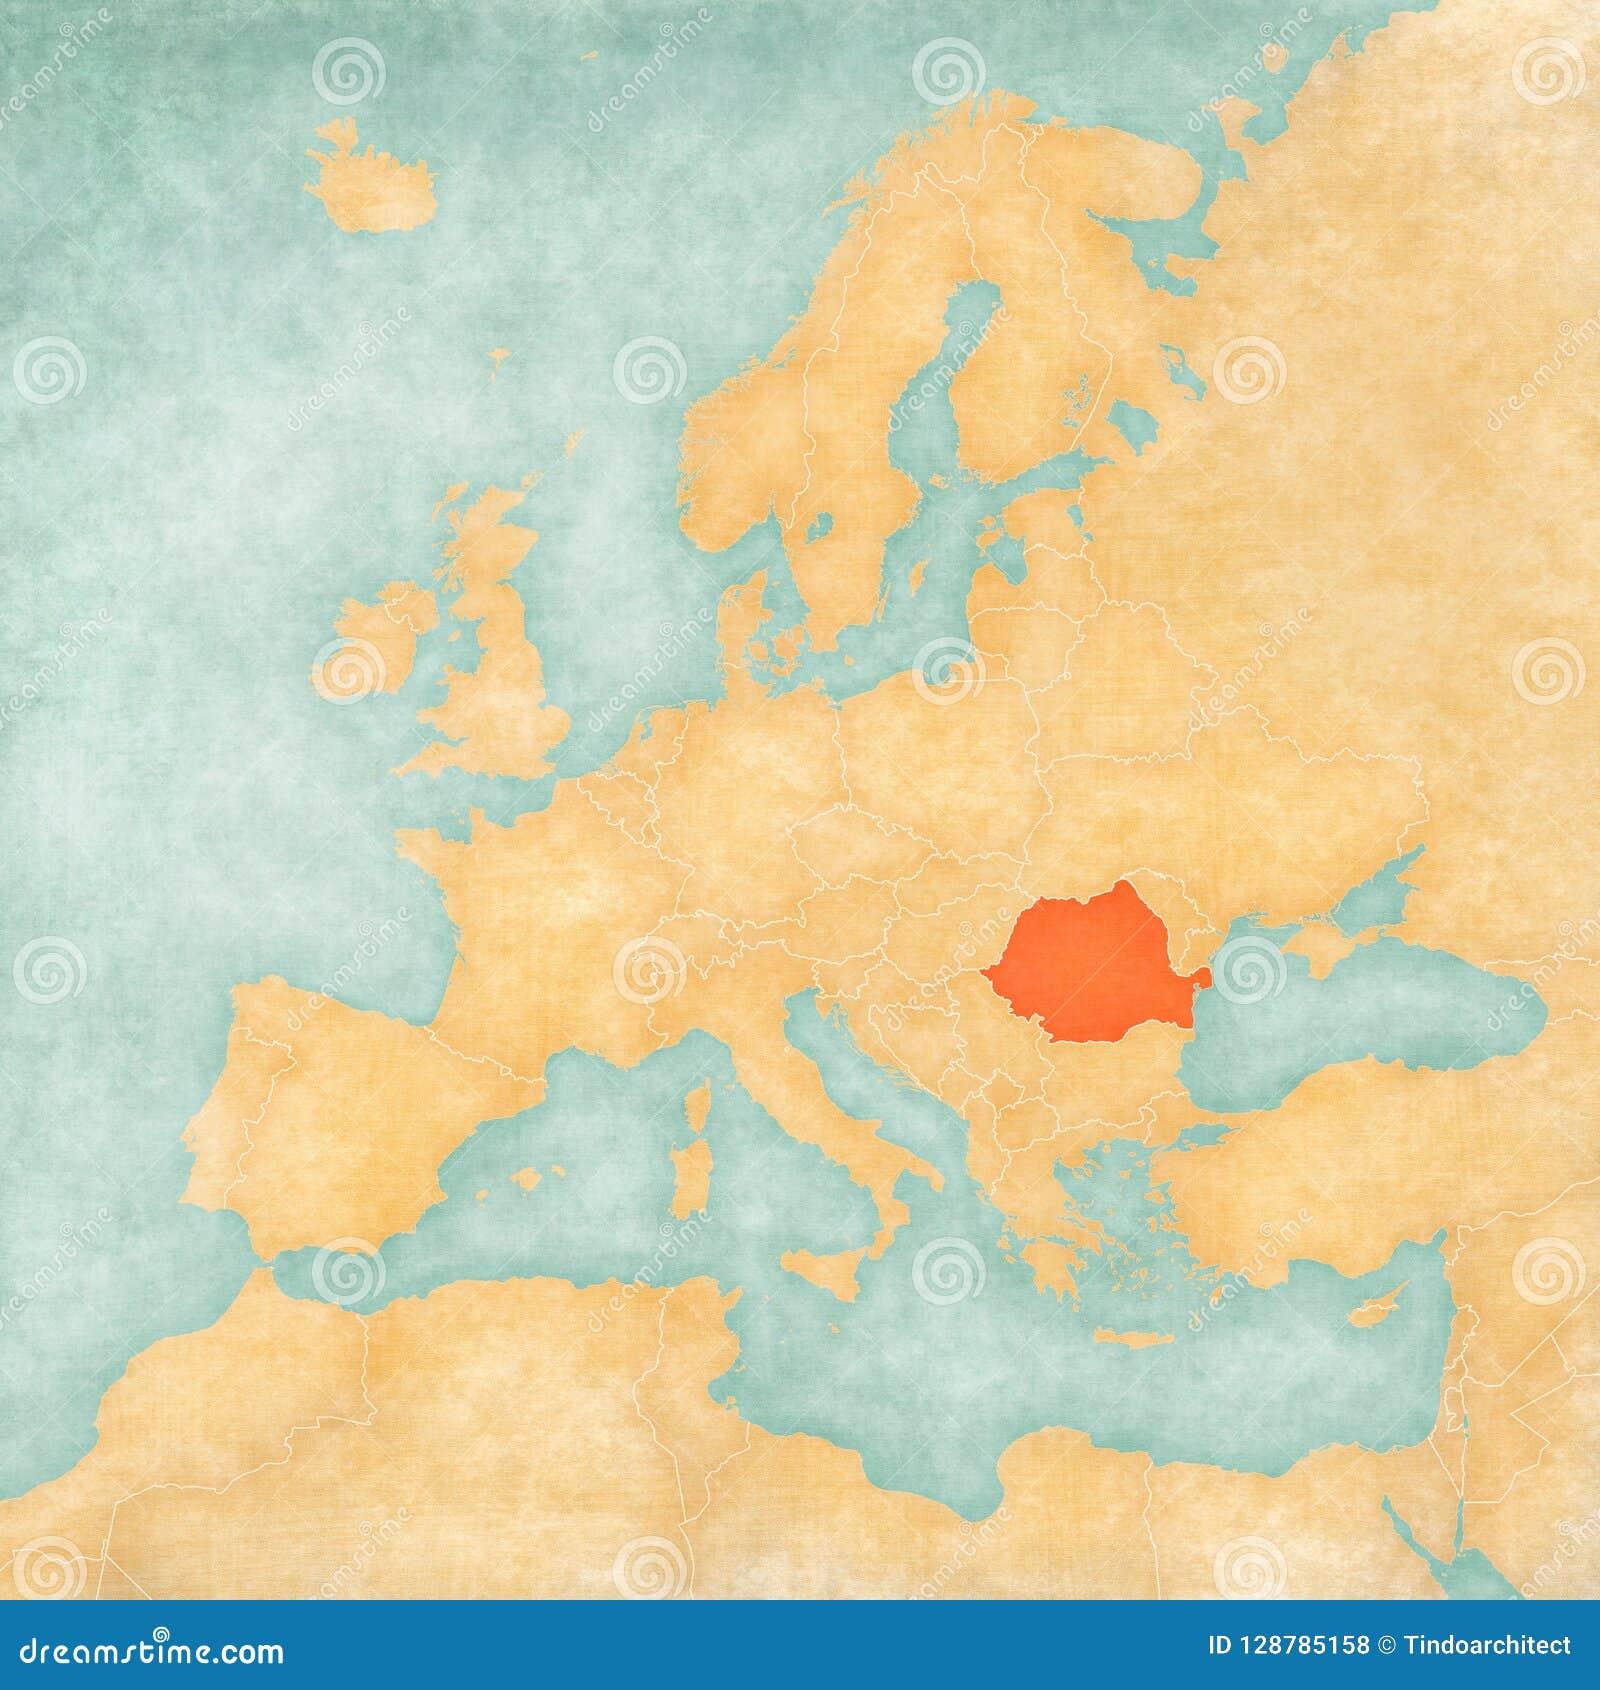 Romania On Map Of Europe.Map Of Europe Romania Stock Illustration Illustration Of Romania